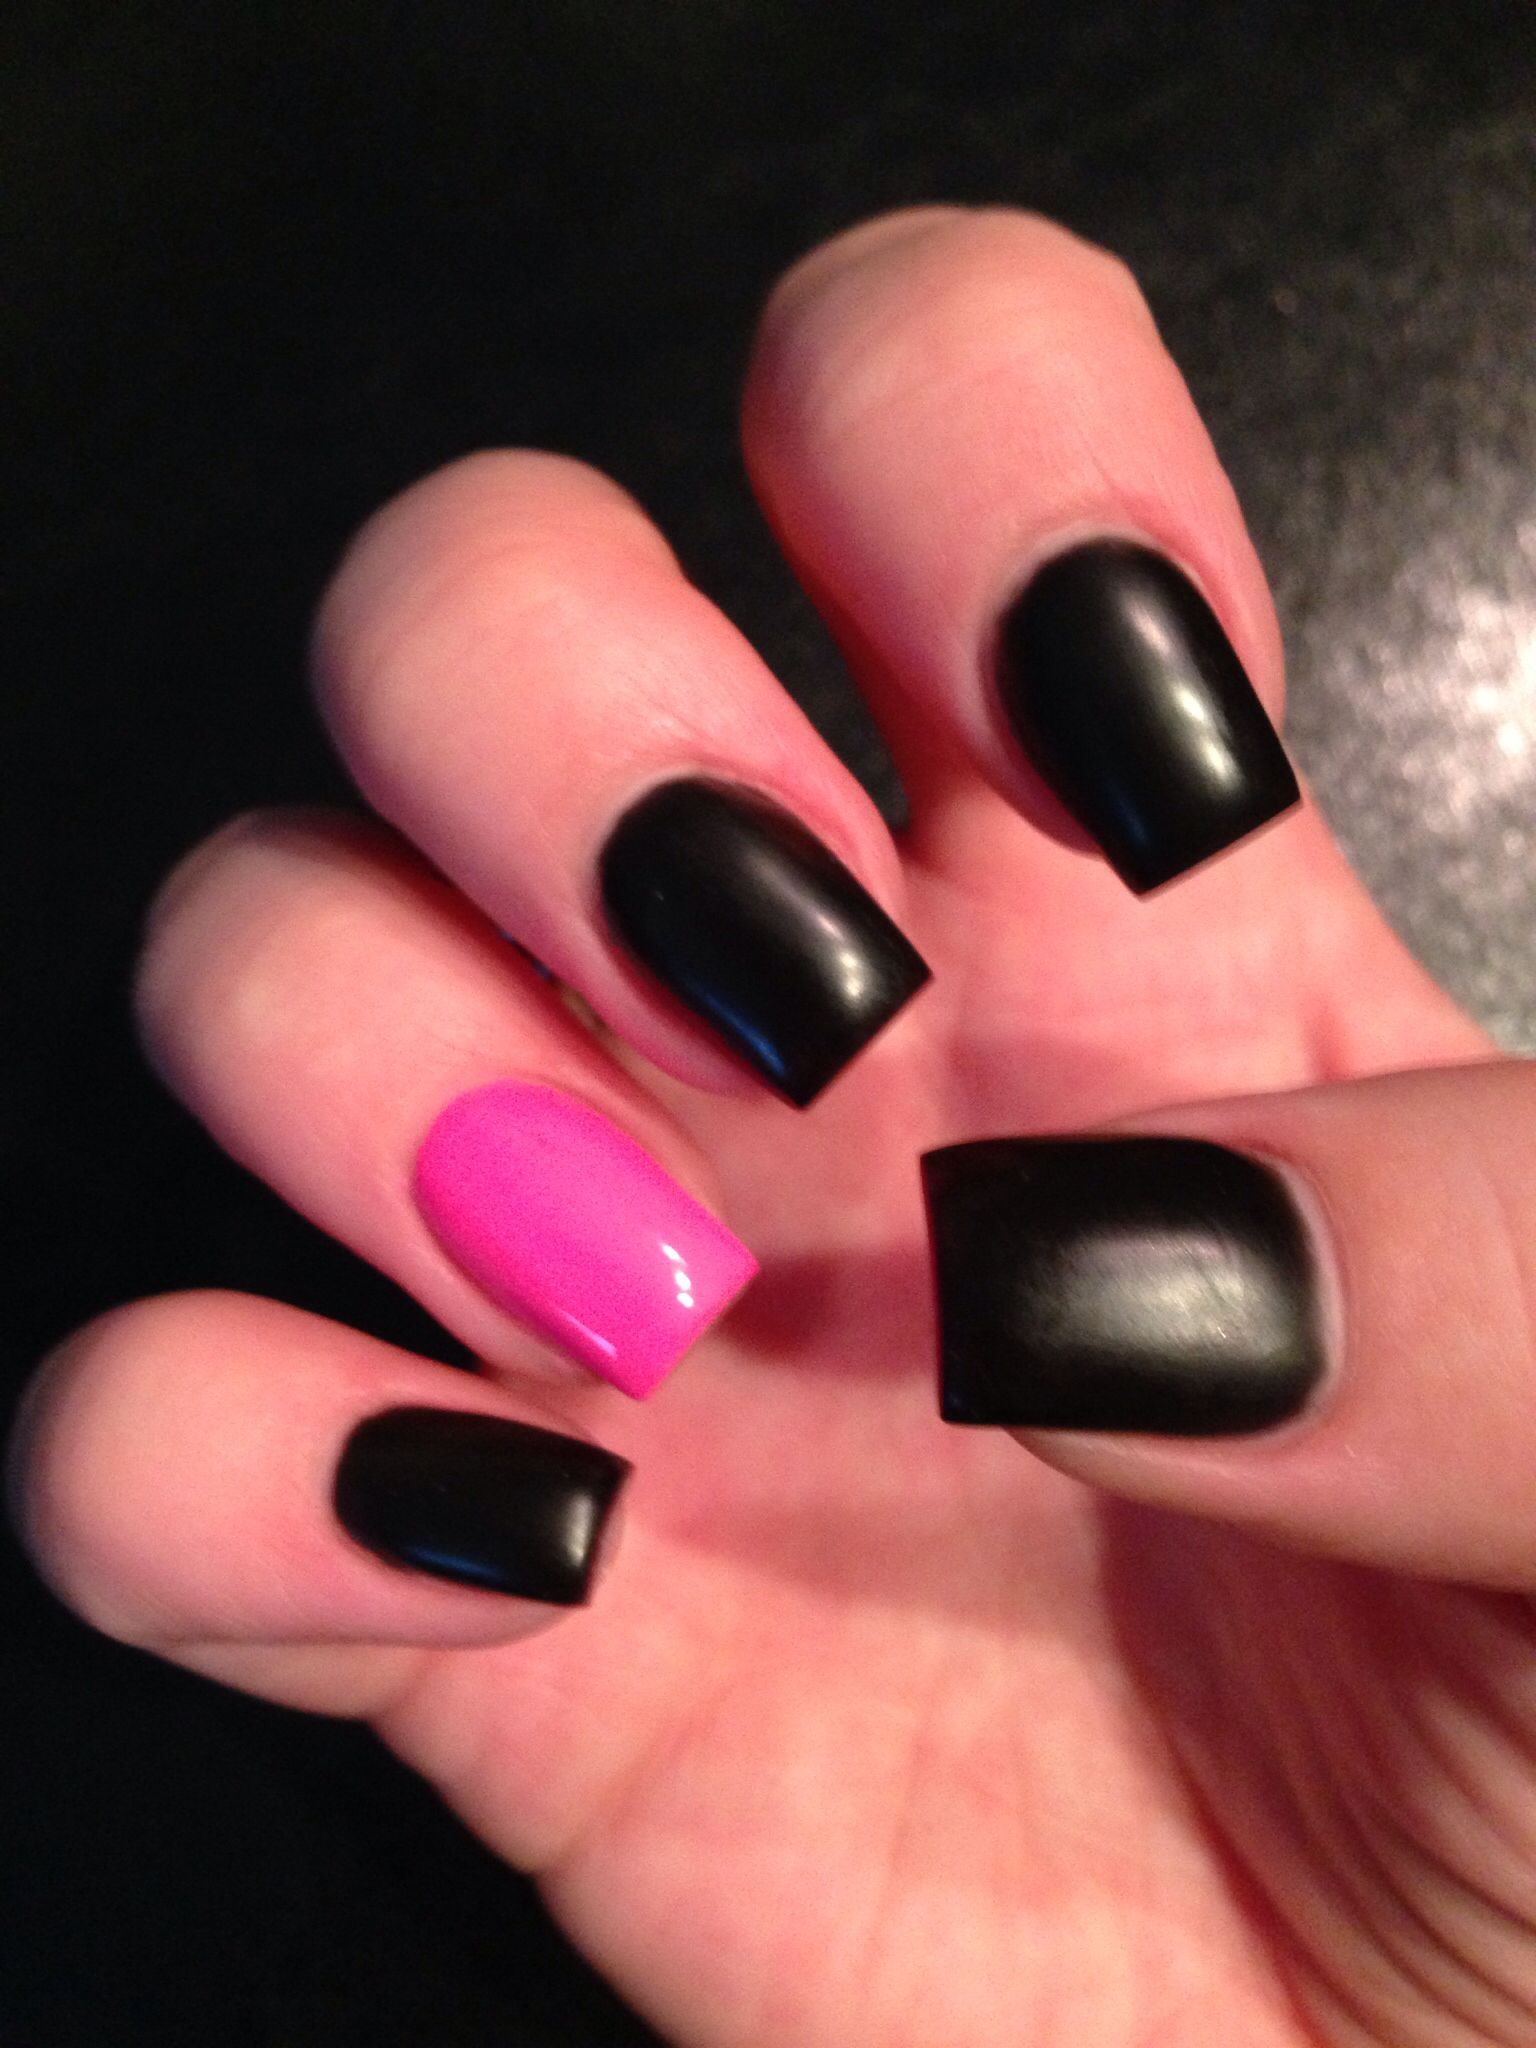 matte black amp pink nails nails pinterest